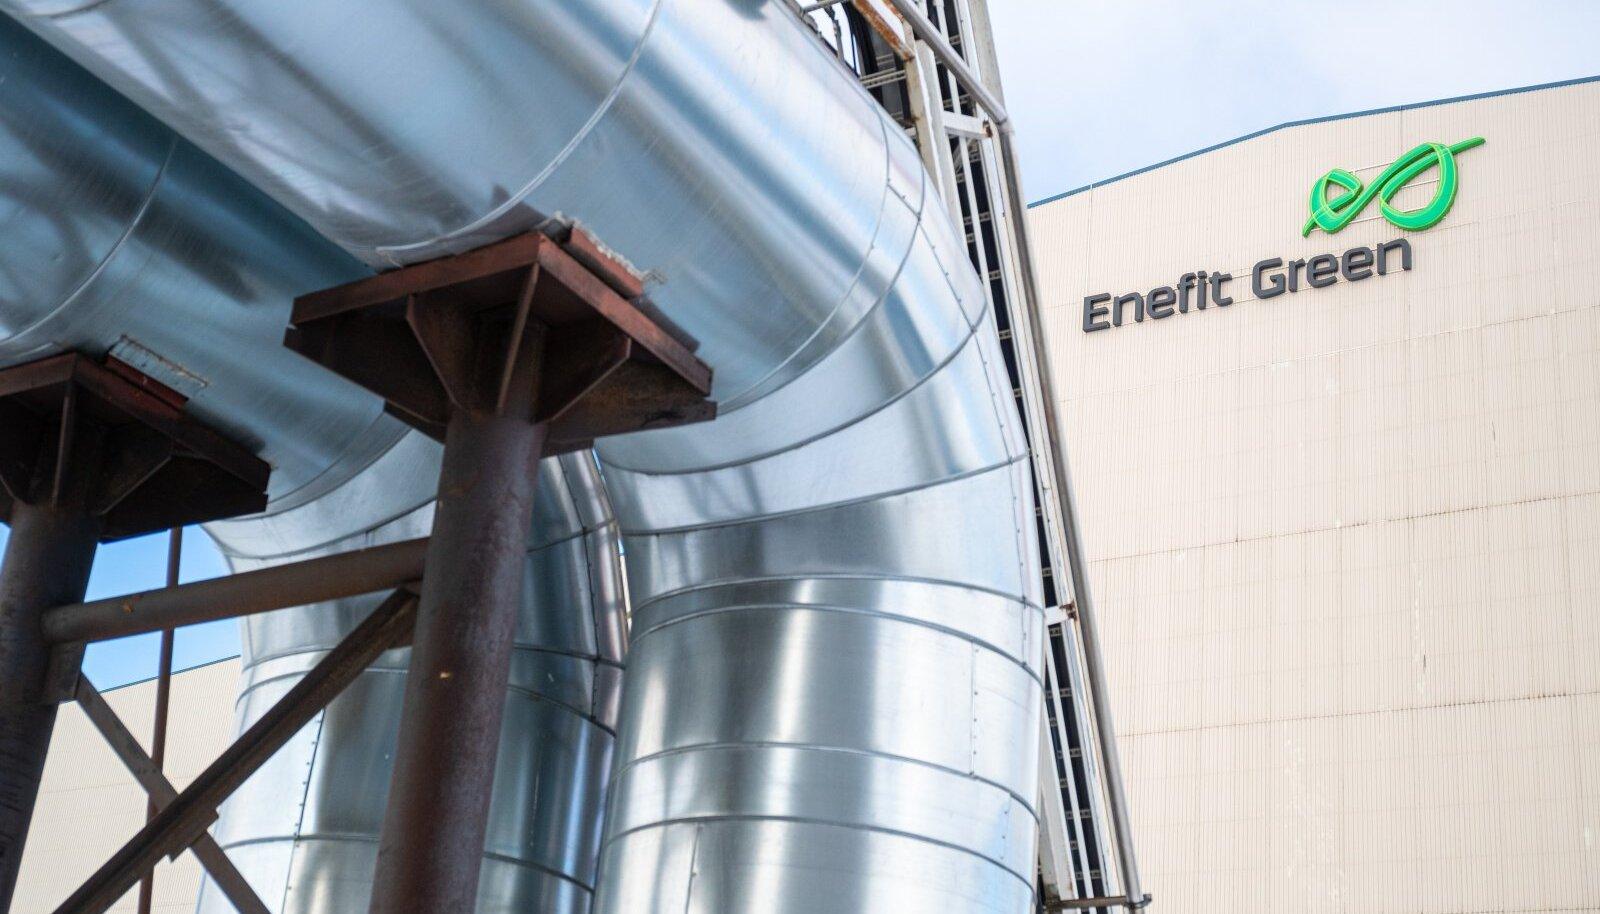 Jäätmepõletus Iru elektrijaamas, Enefit Green